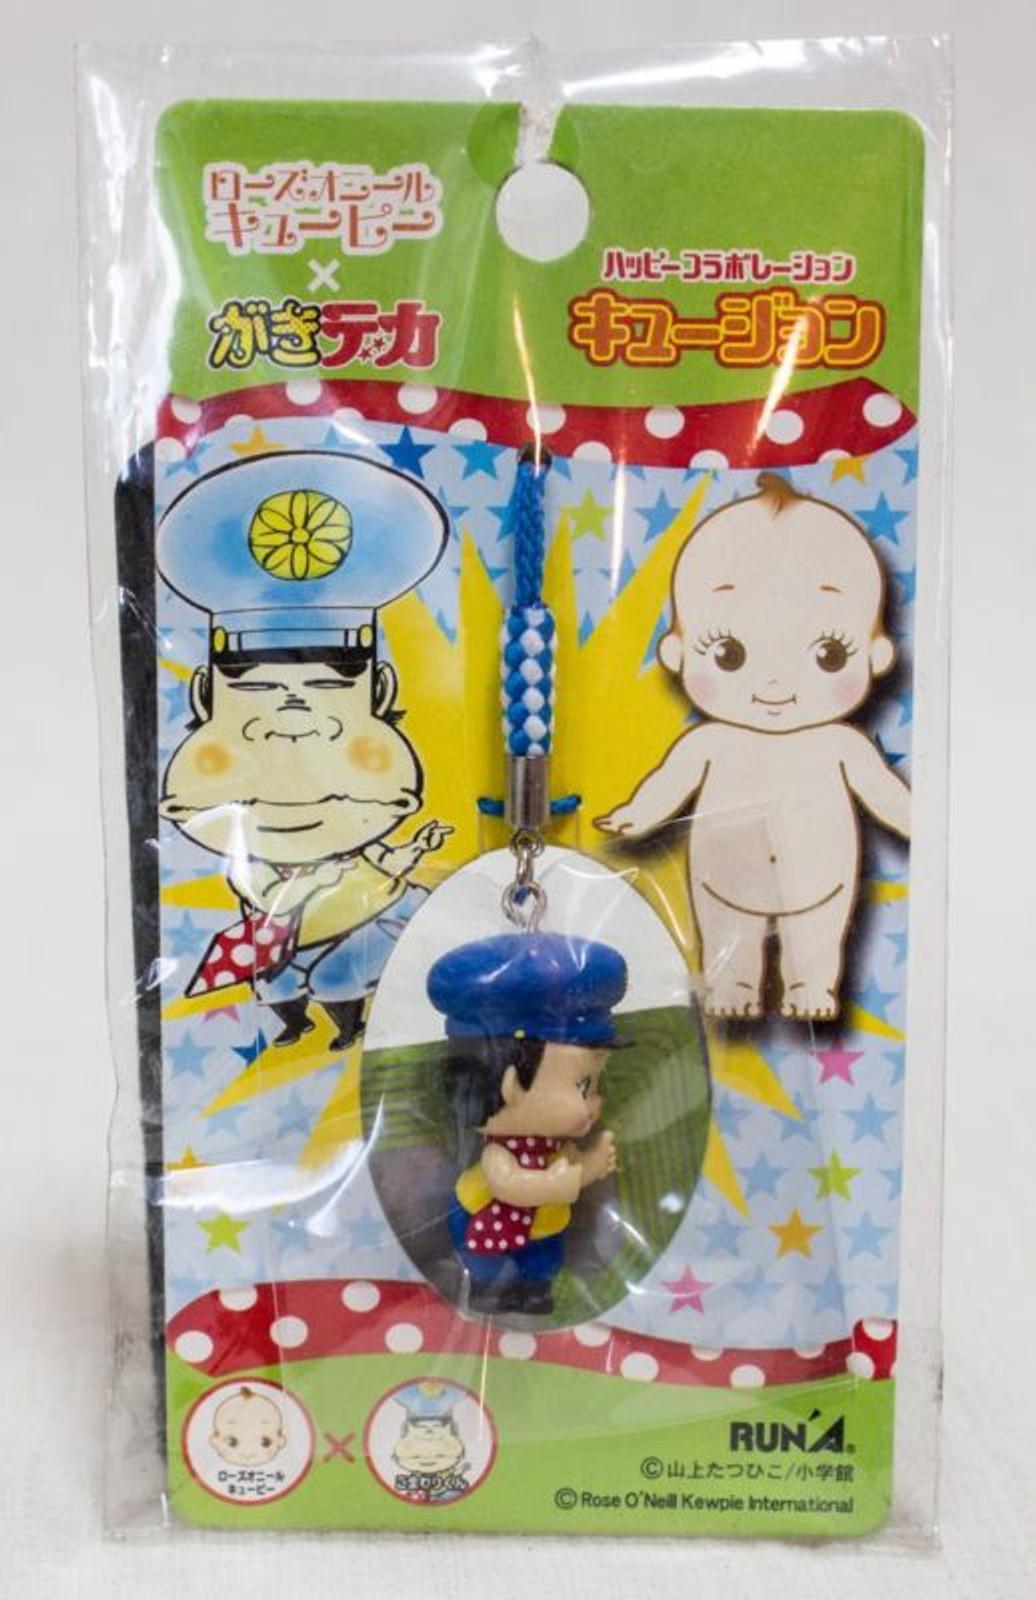 Gakideka Rose O'neill Kewpie Kewsion Figure Strap JAPAN ANIME